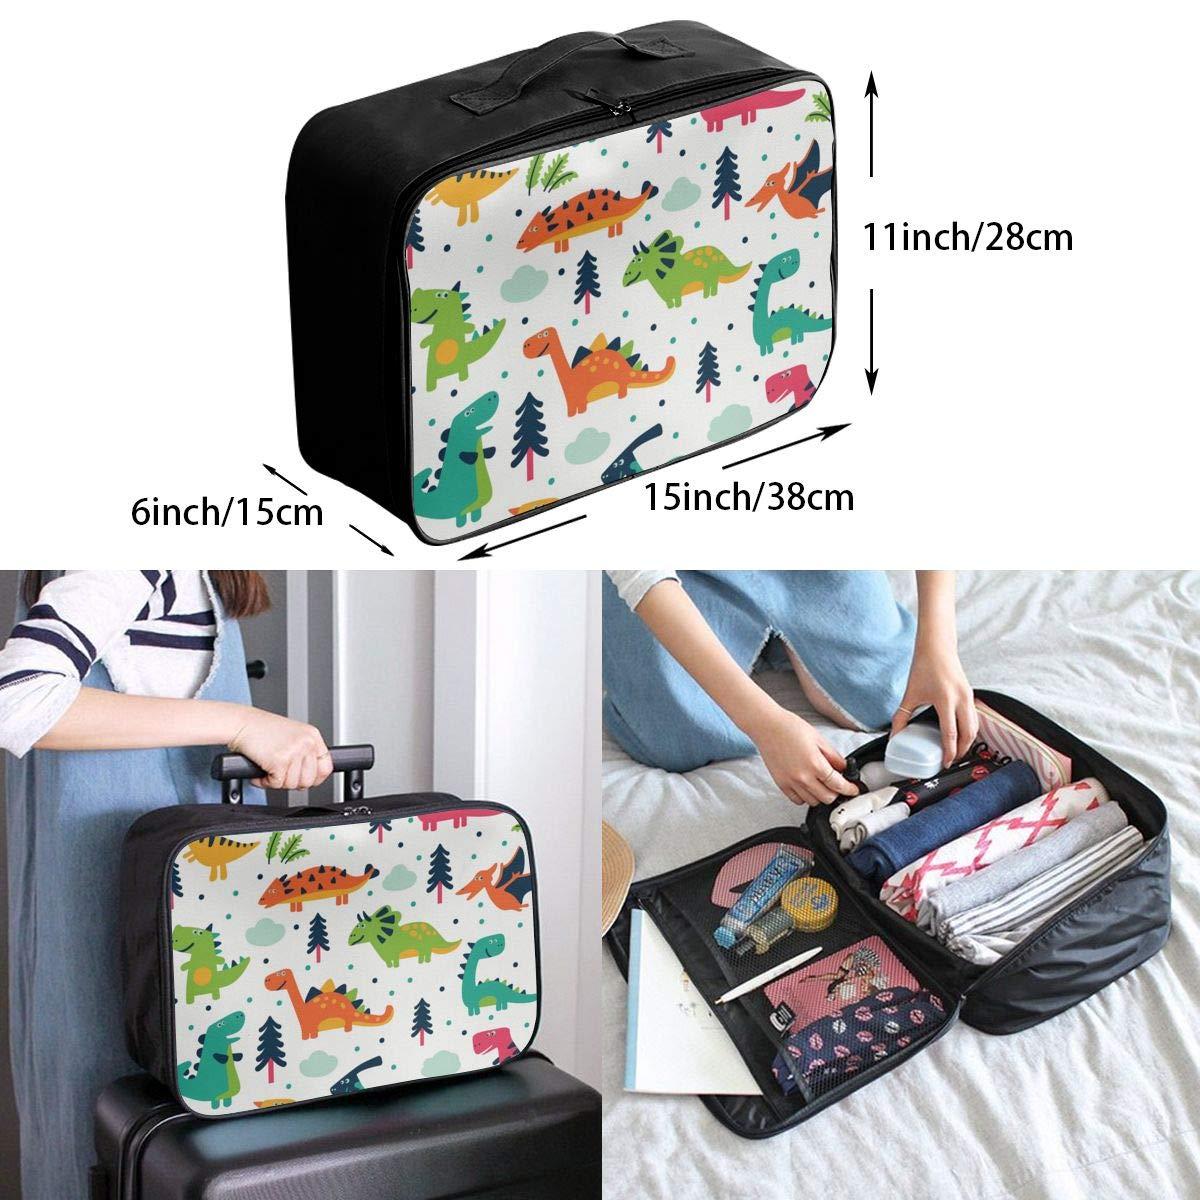 Cartoon Dinosaur Set Travel Duffel Bag Casual Large Capacity Portable Luggage Bag Suitcase Storage Bag Luggage Packing Tote Bag Weekend Trip